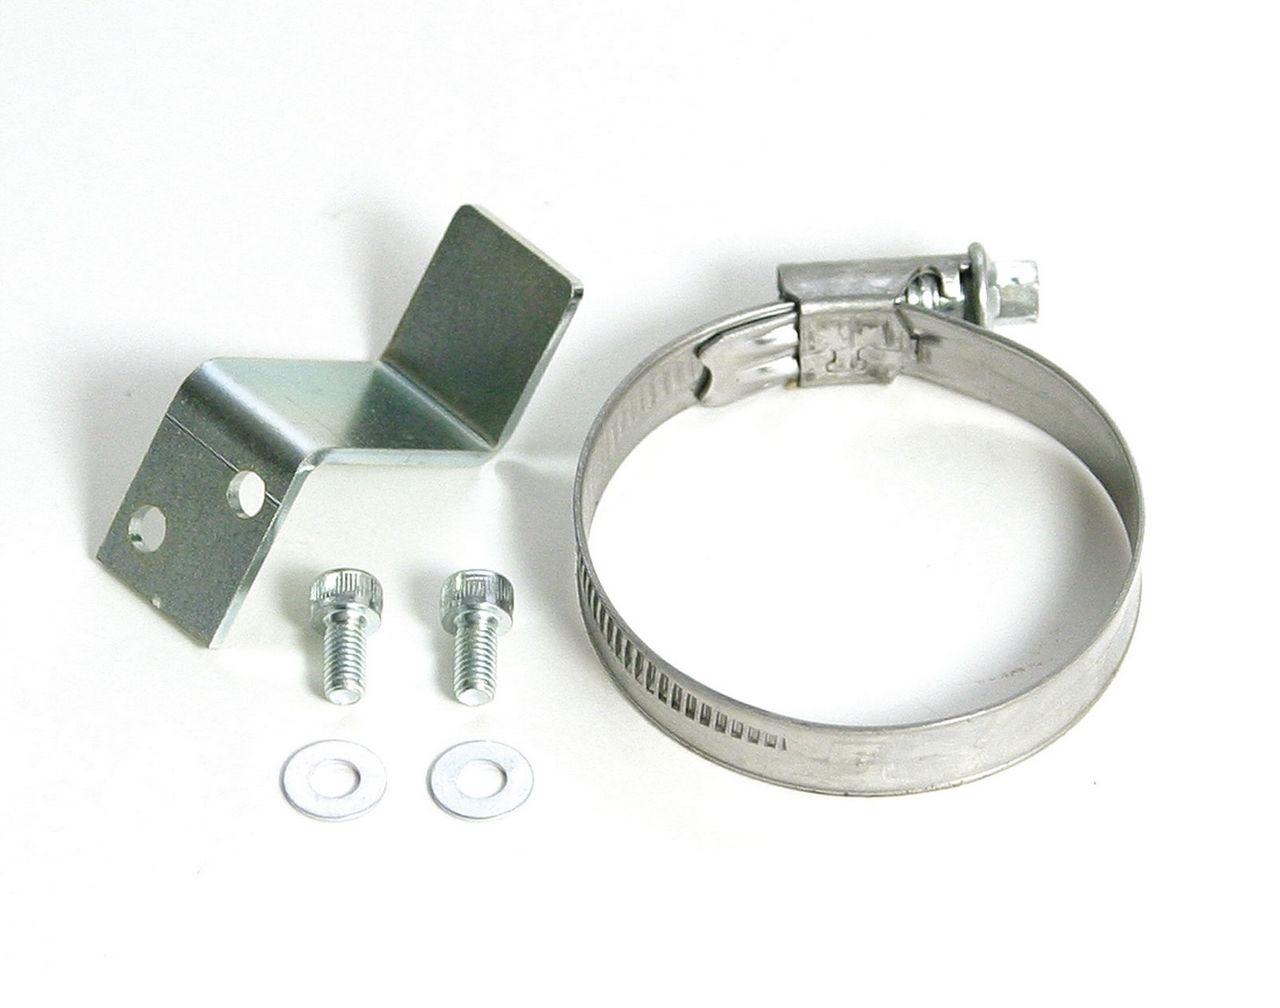 【SP武川】機油冷卻器支架套件(XR50R/CRF50F) - 「Webike-摩托百貨」